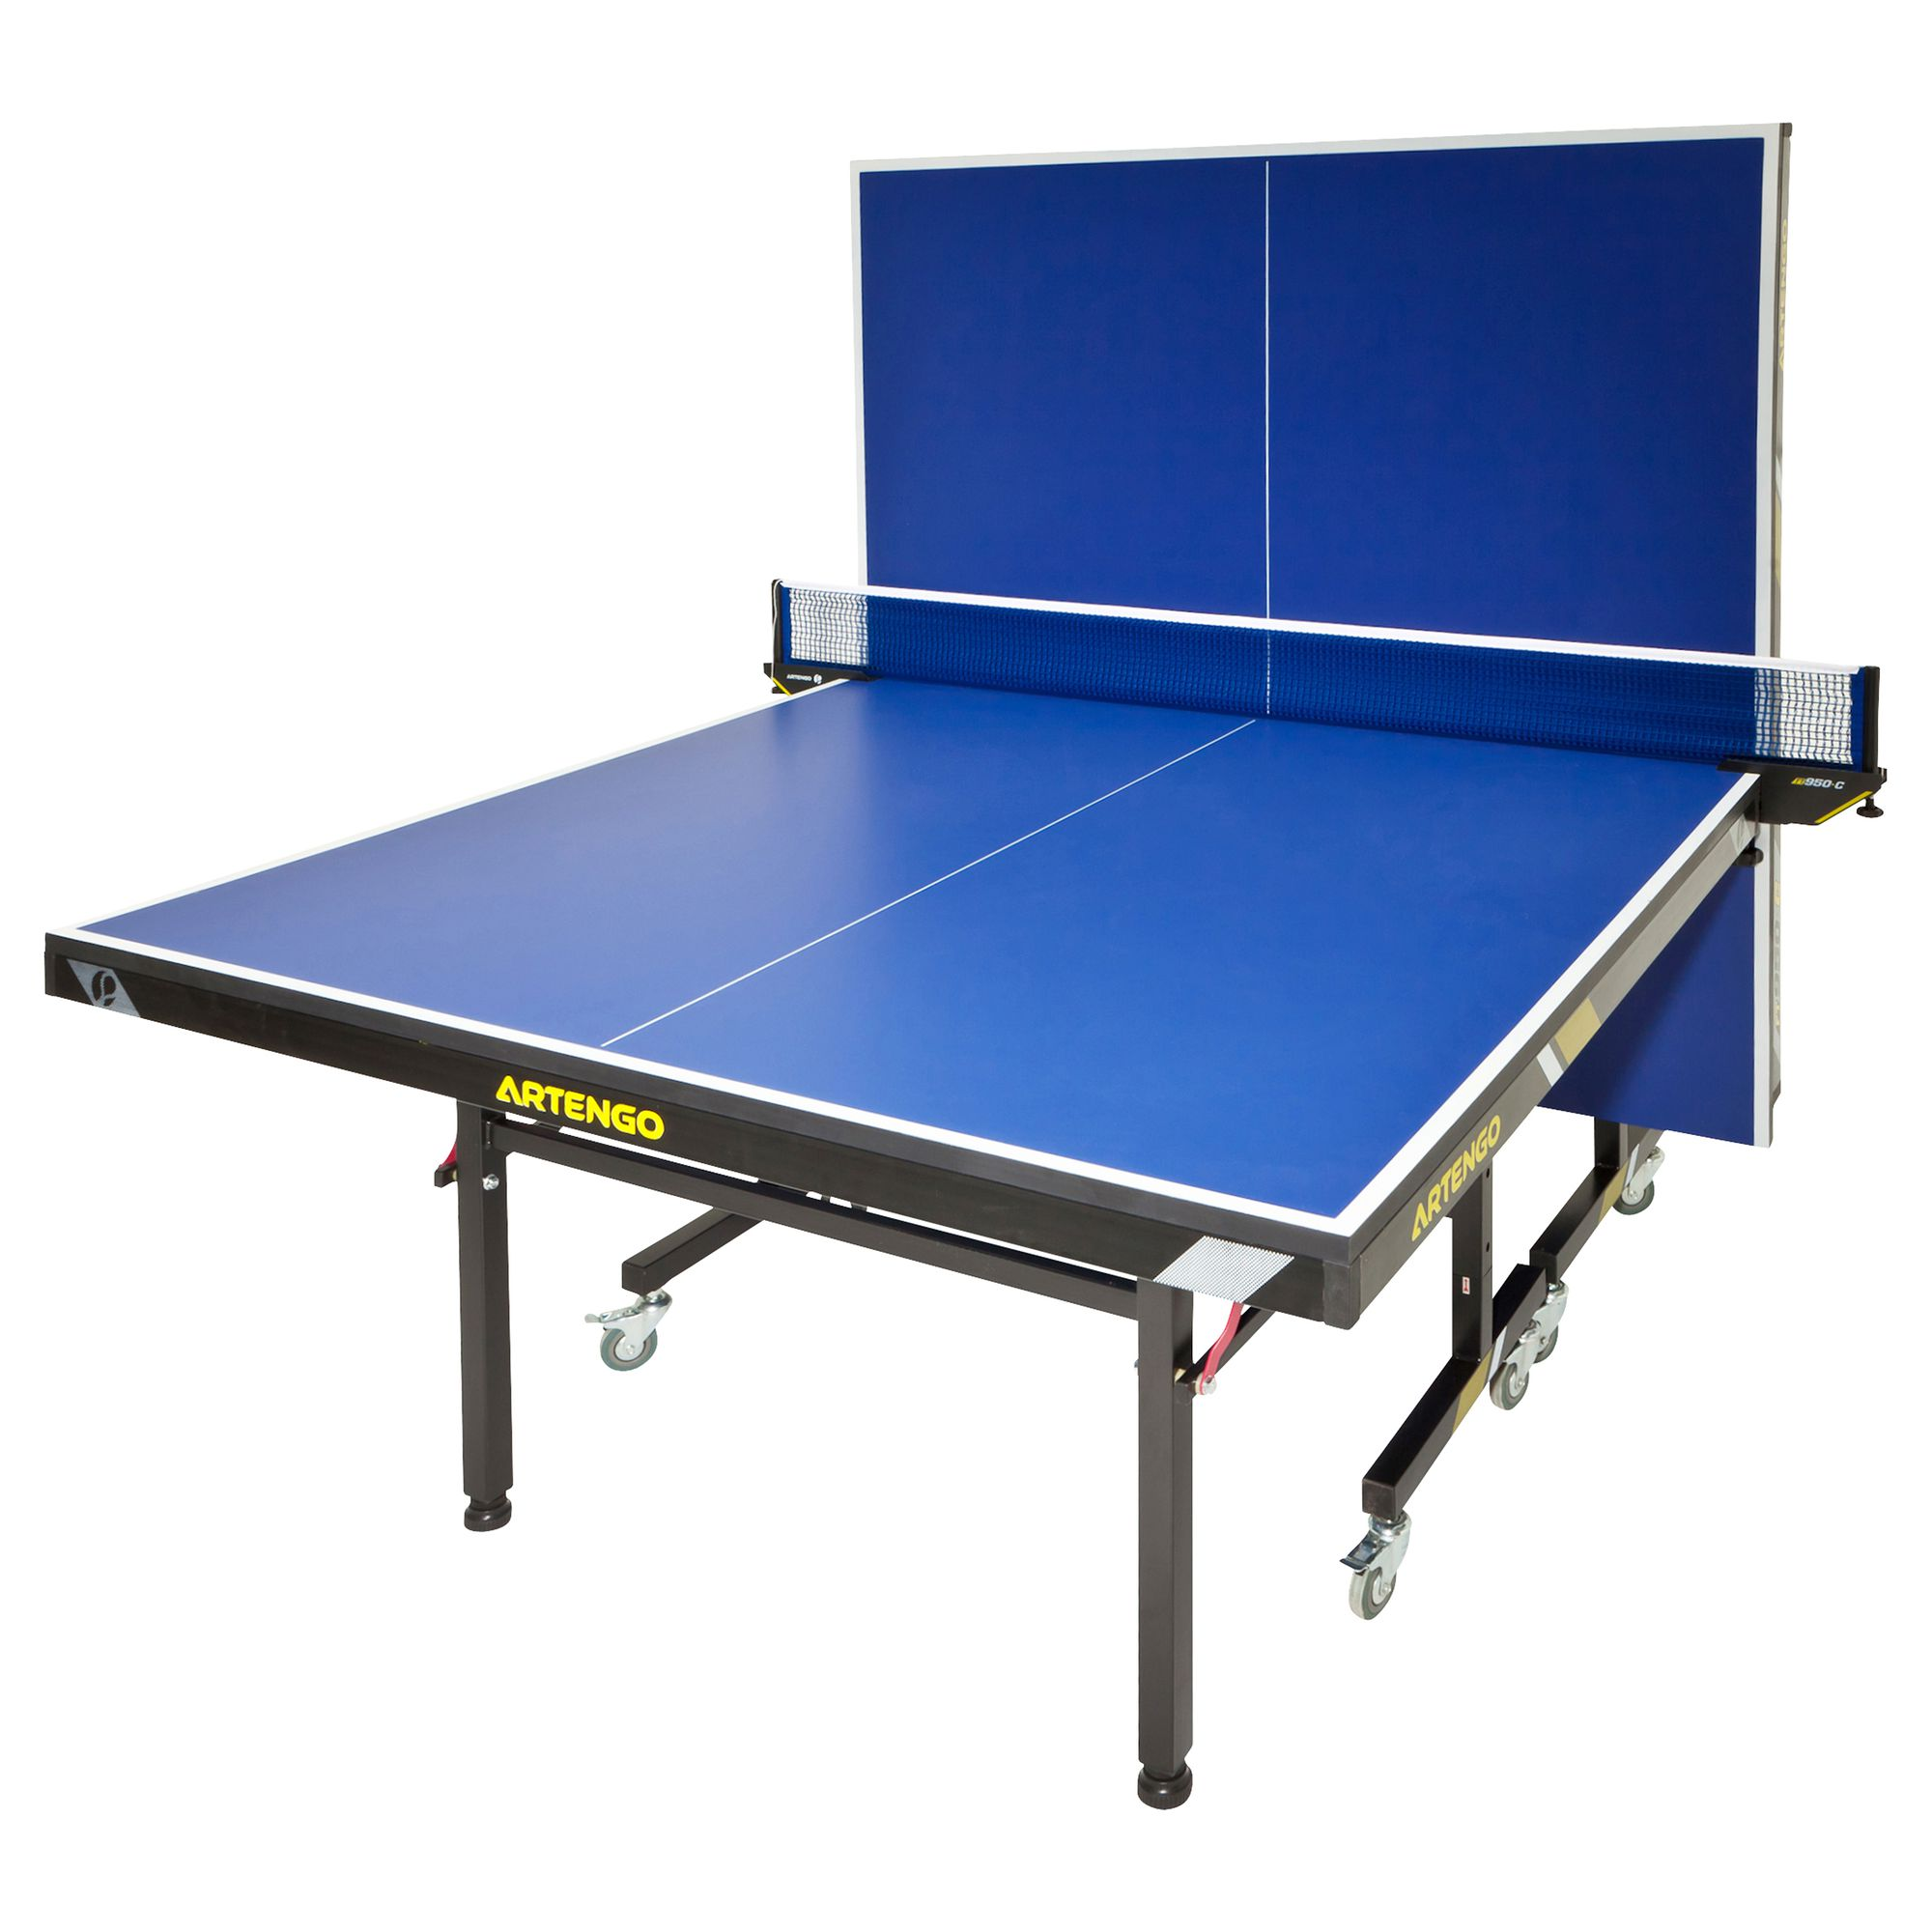 table de tennis de table homologu e ft950 fftt club bleu clubs collectivit s decathlon pro. Black Bedroom Furniture Sets. Home Design Ideas